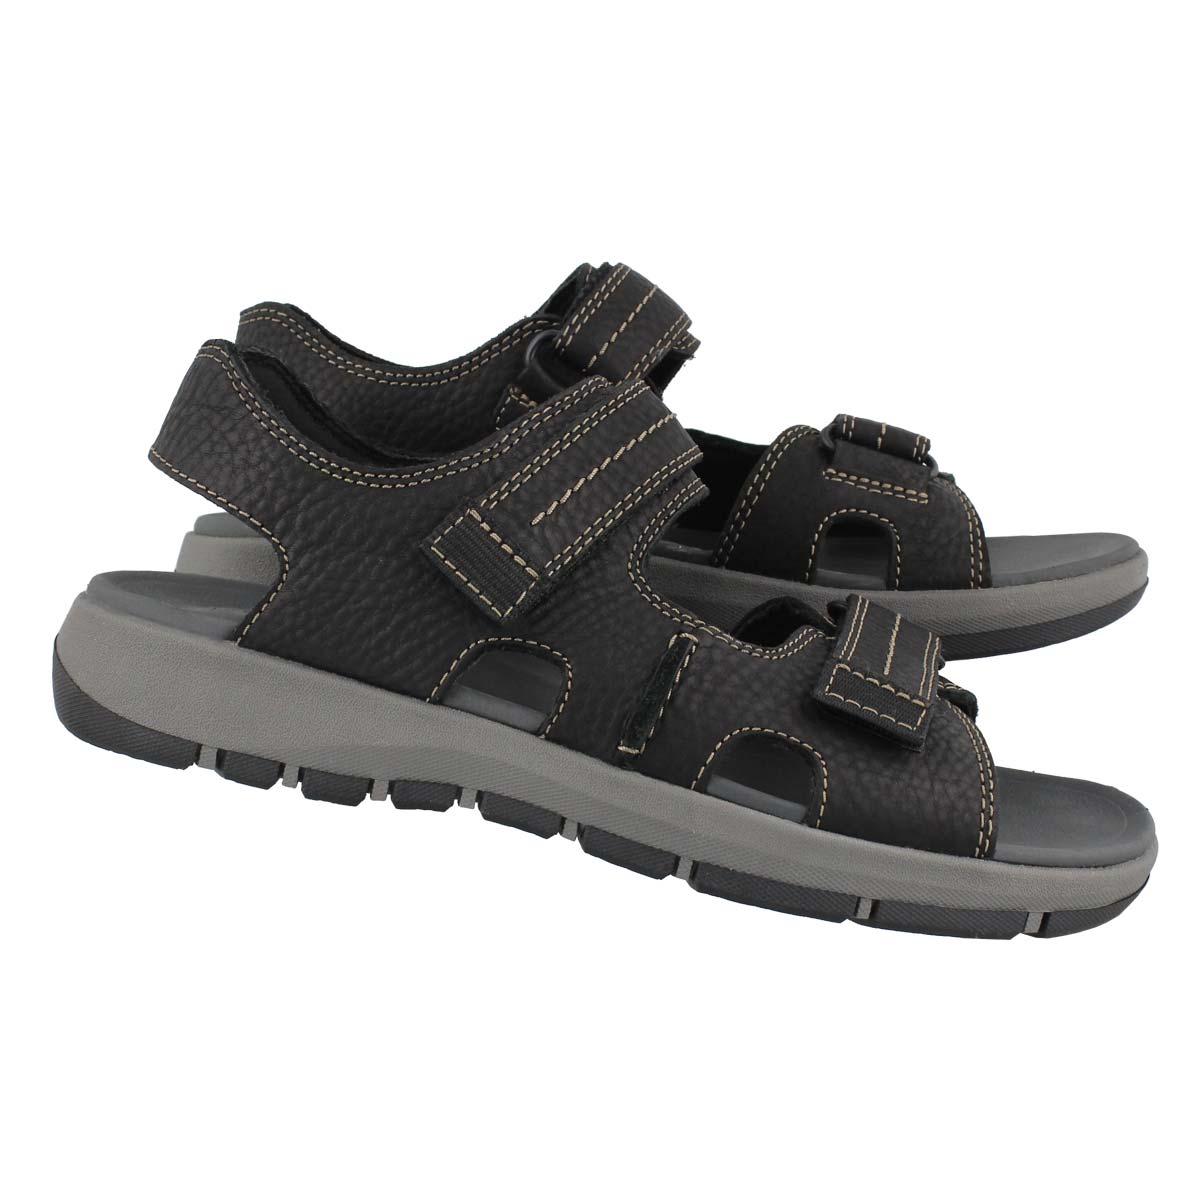 Mns Brixby Shore black casual sandal